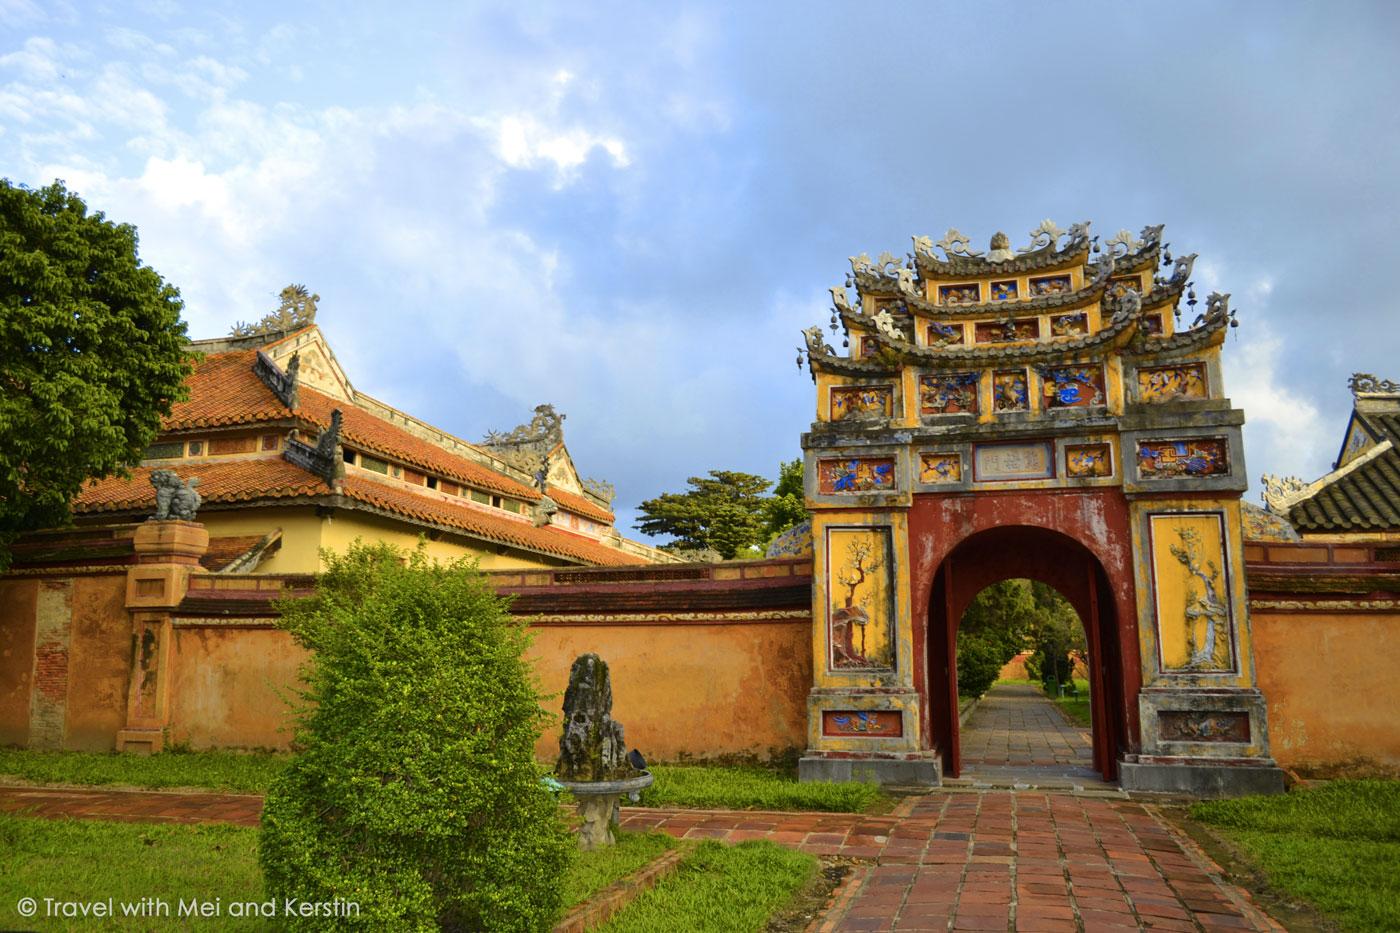 Imperial City of Hue, Central Vietnam